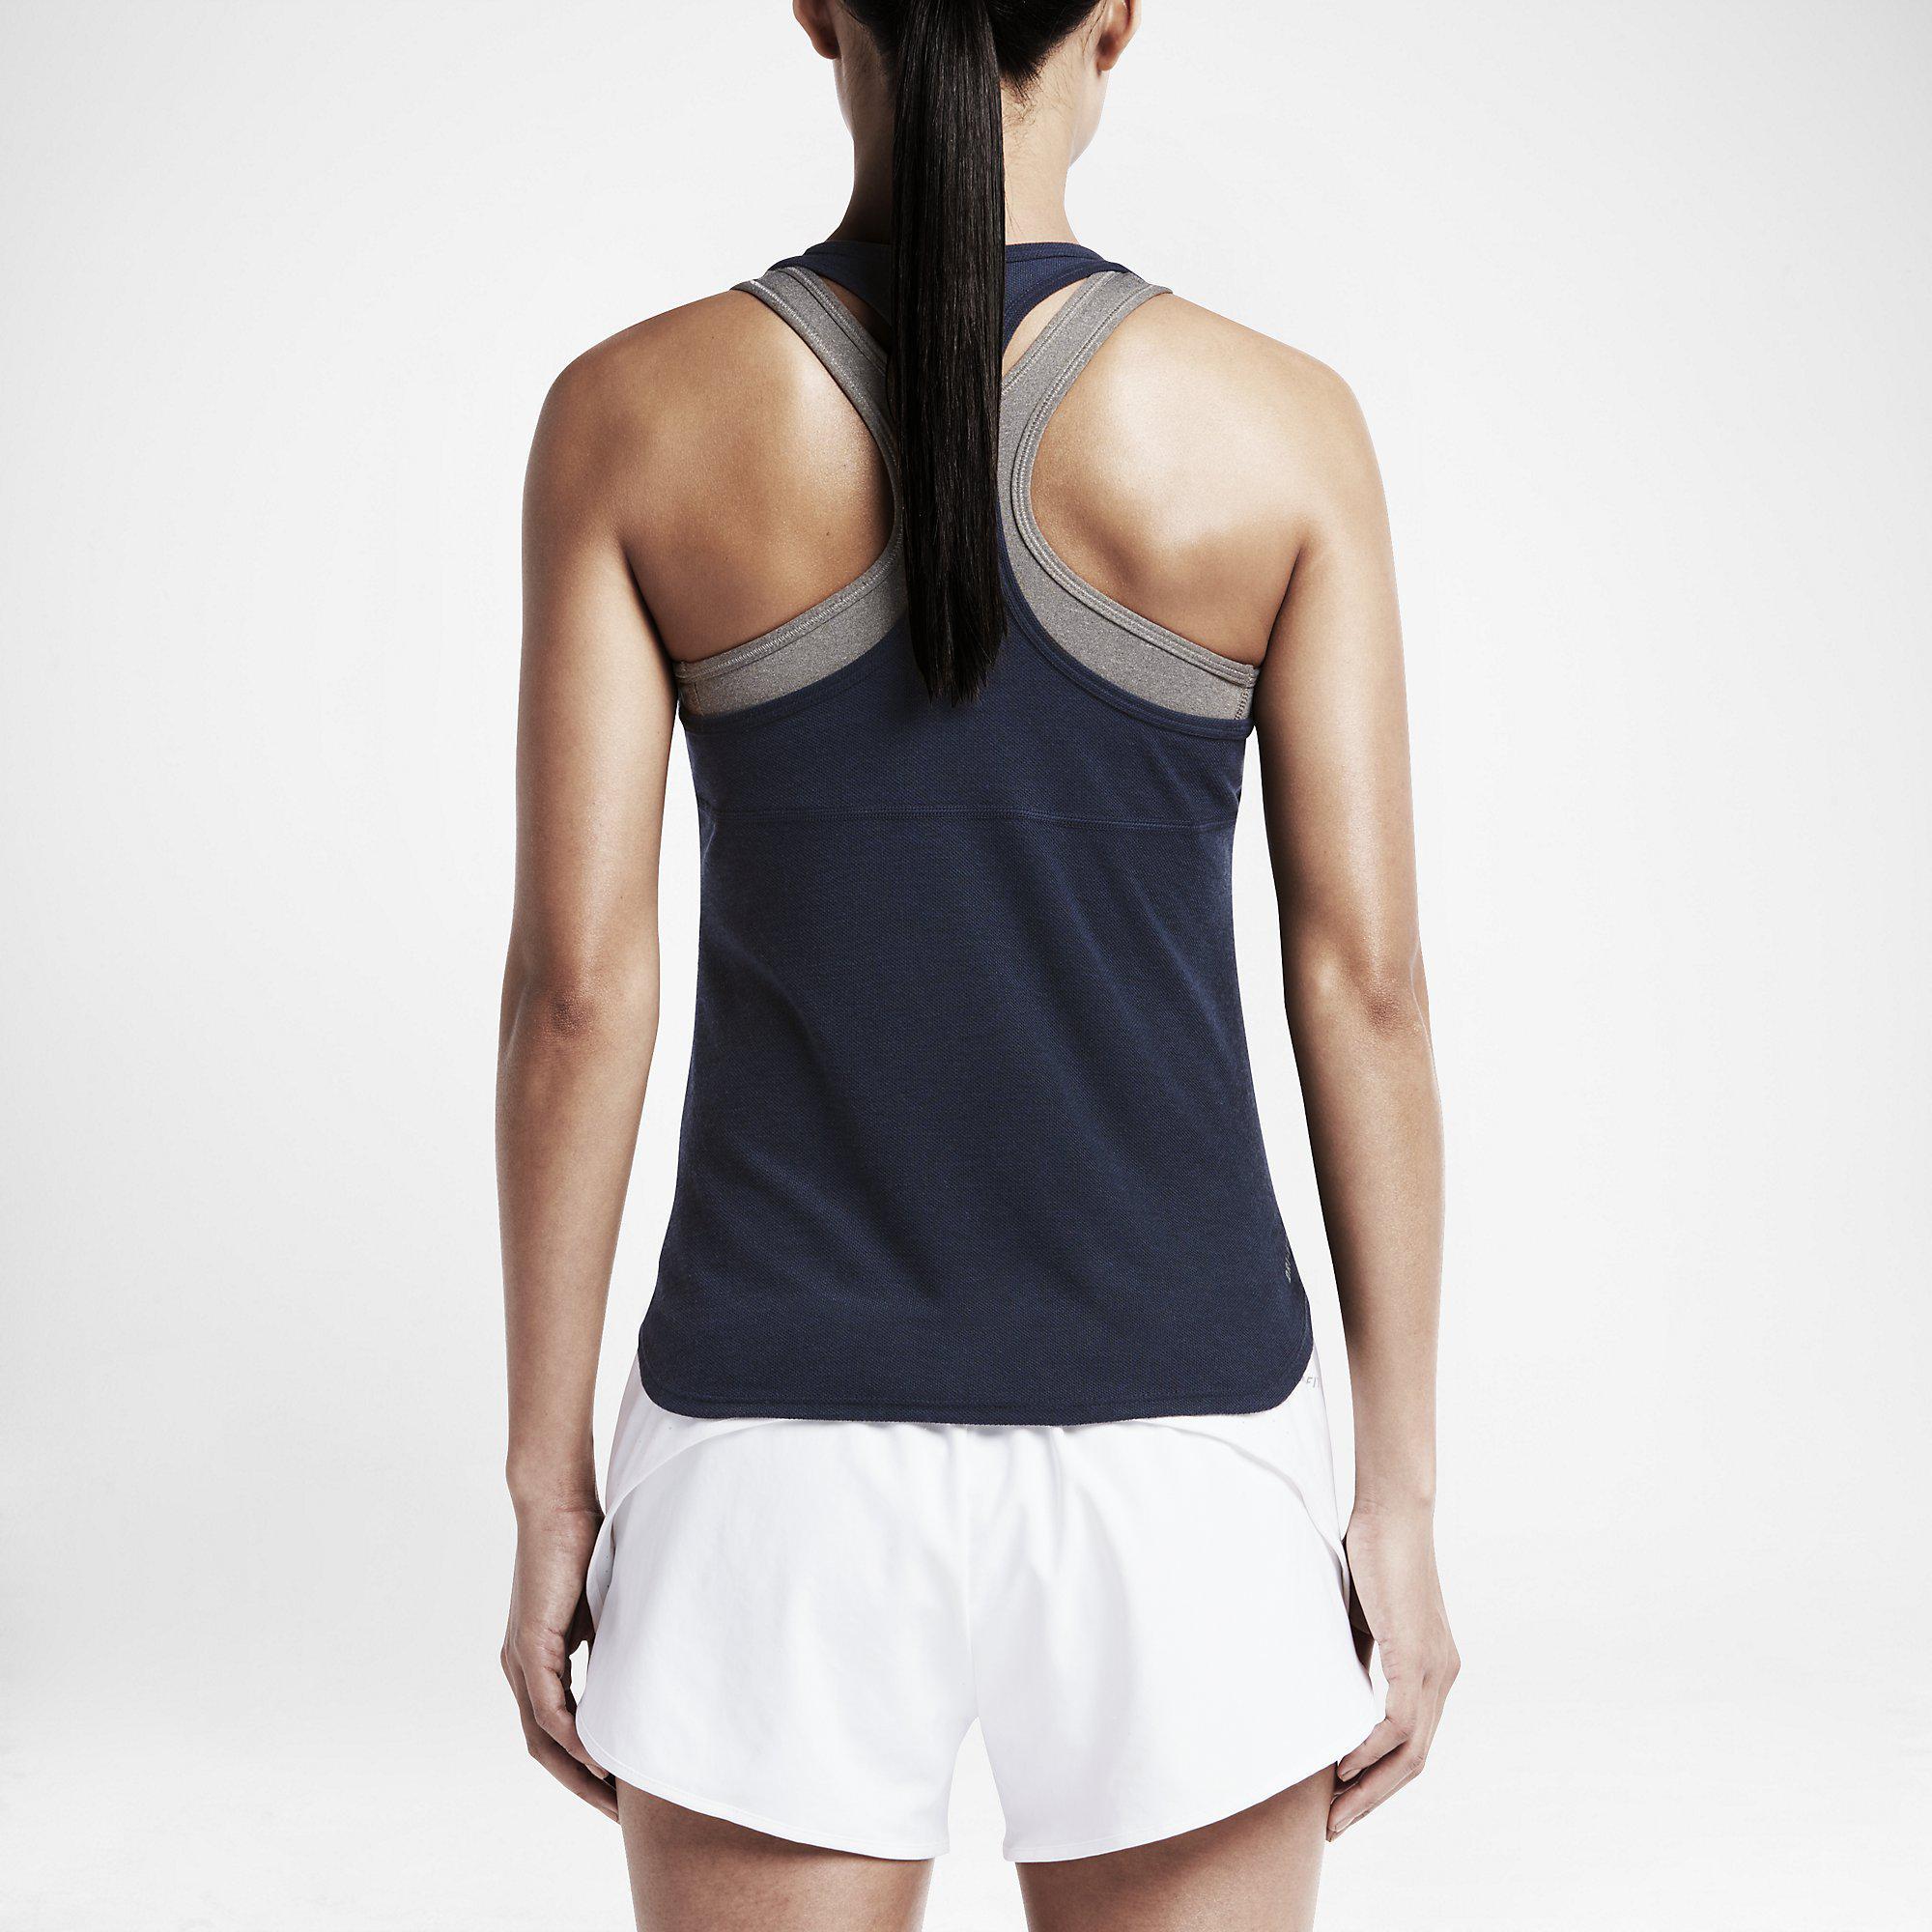 Nike Womens Dry Slam Tank Top - Navy